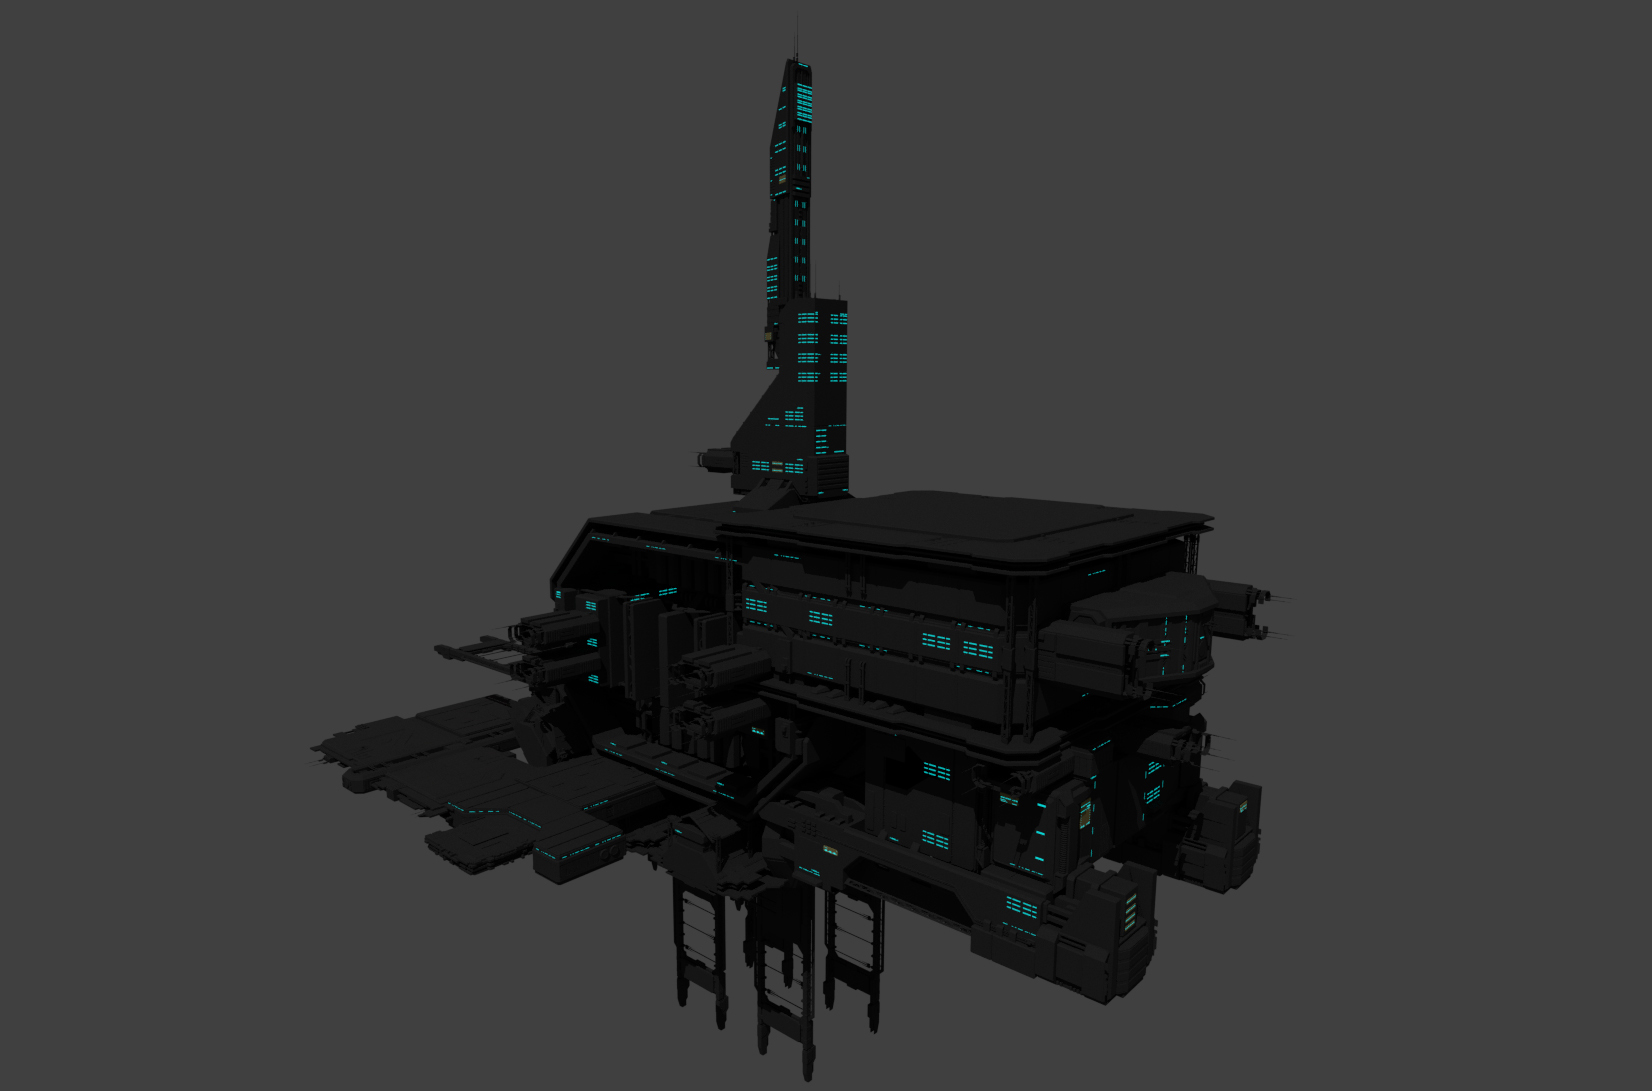 spacestationwindows